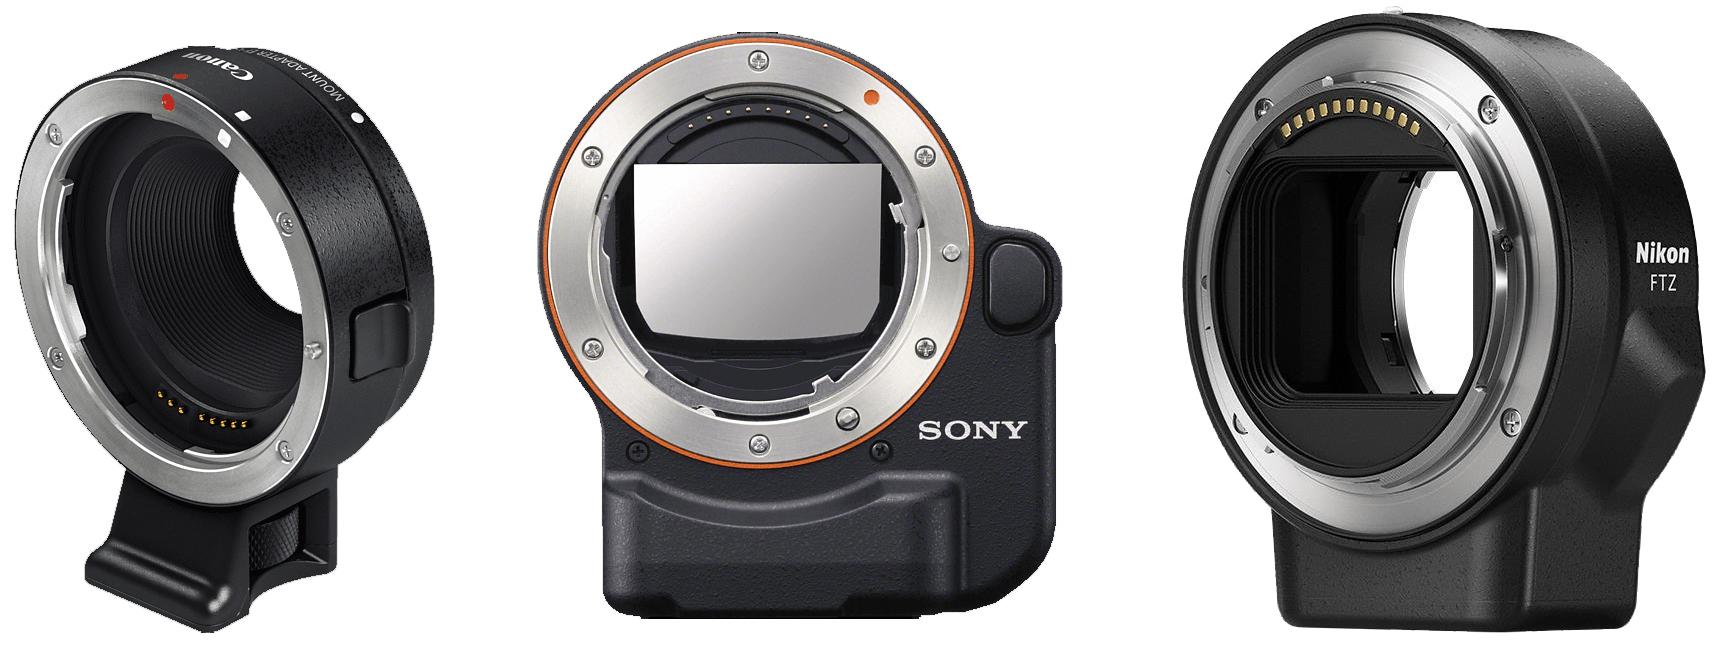 Kamera Adapter